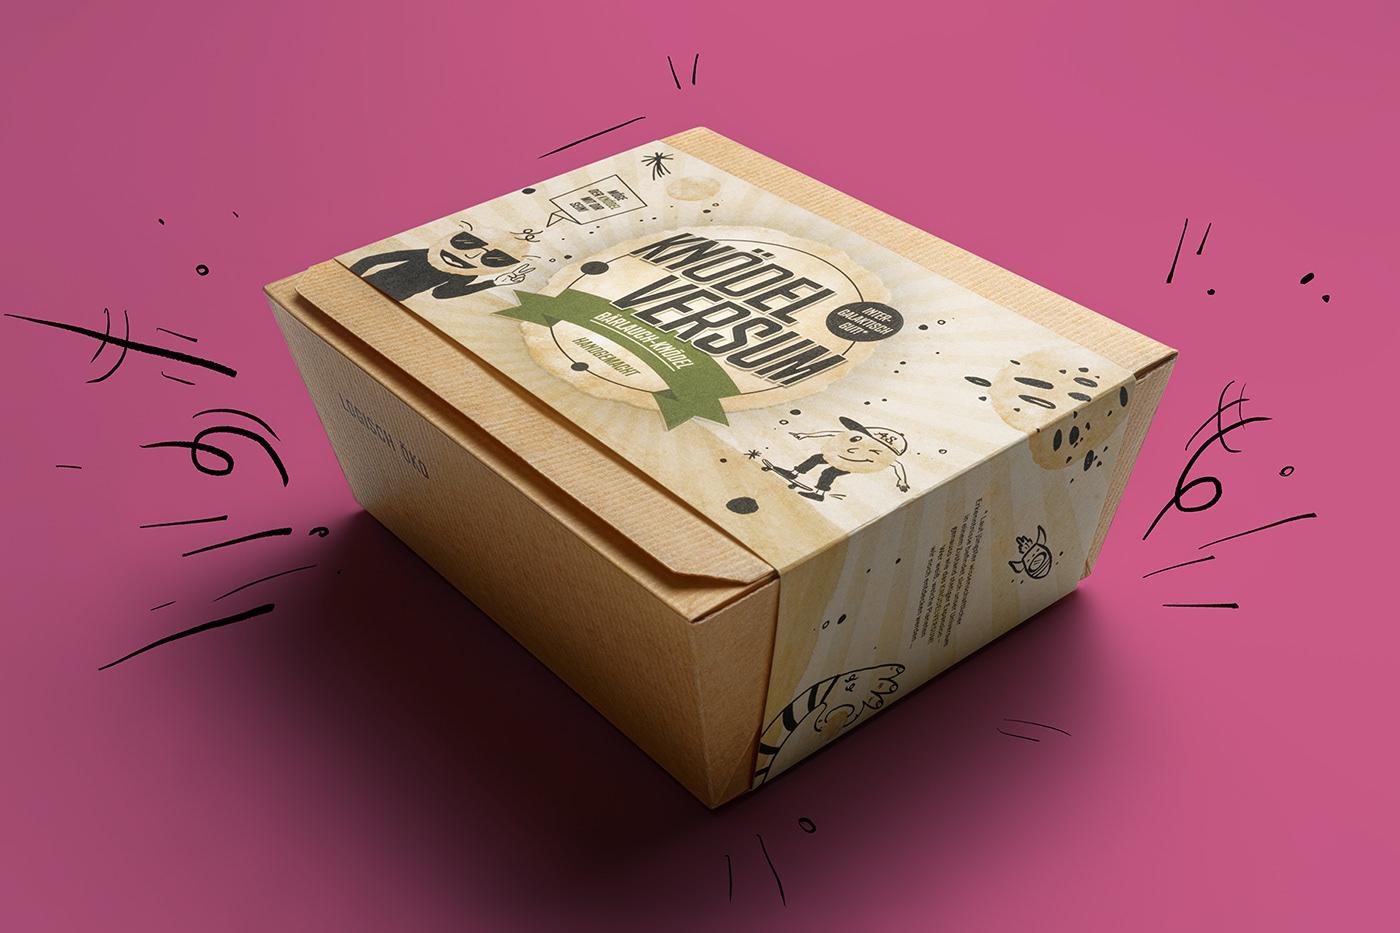 branding  dumblings graphicdesign Packaging packagingdesign printdesign universe wirsindartisten